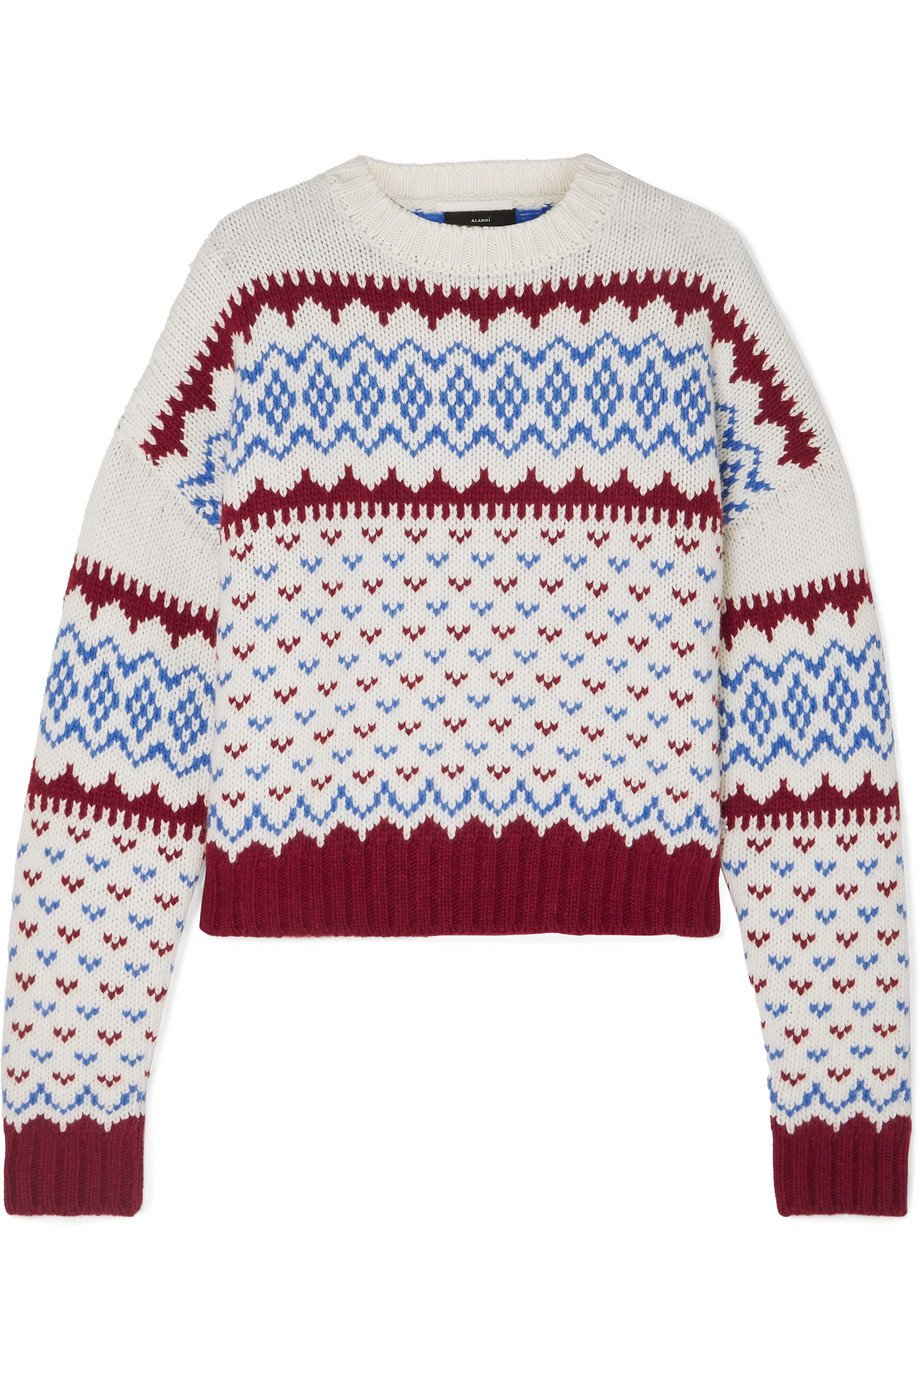 Alanui | Fair Isle wool and cashmere-blend sweater | NET-A-PORTER.COM